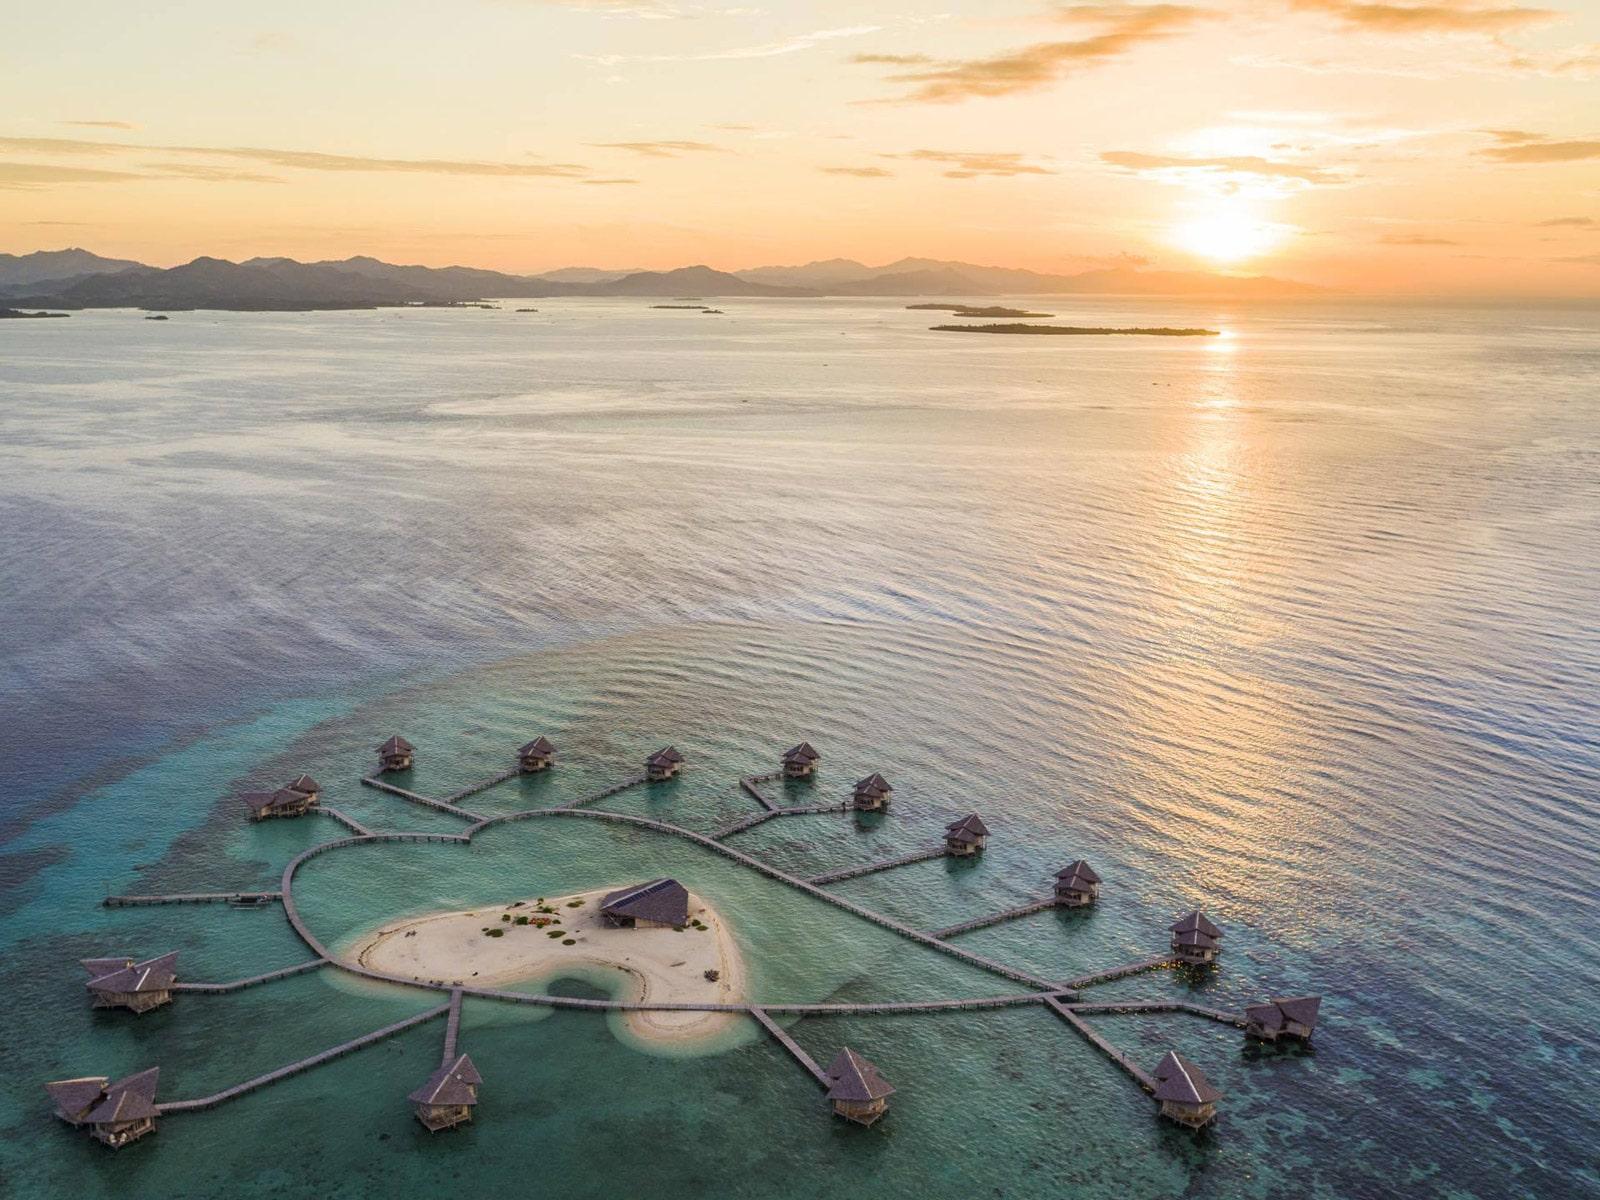 rondreis indonesie gorontalo pulo cinta hotel blog 4